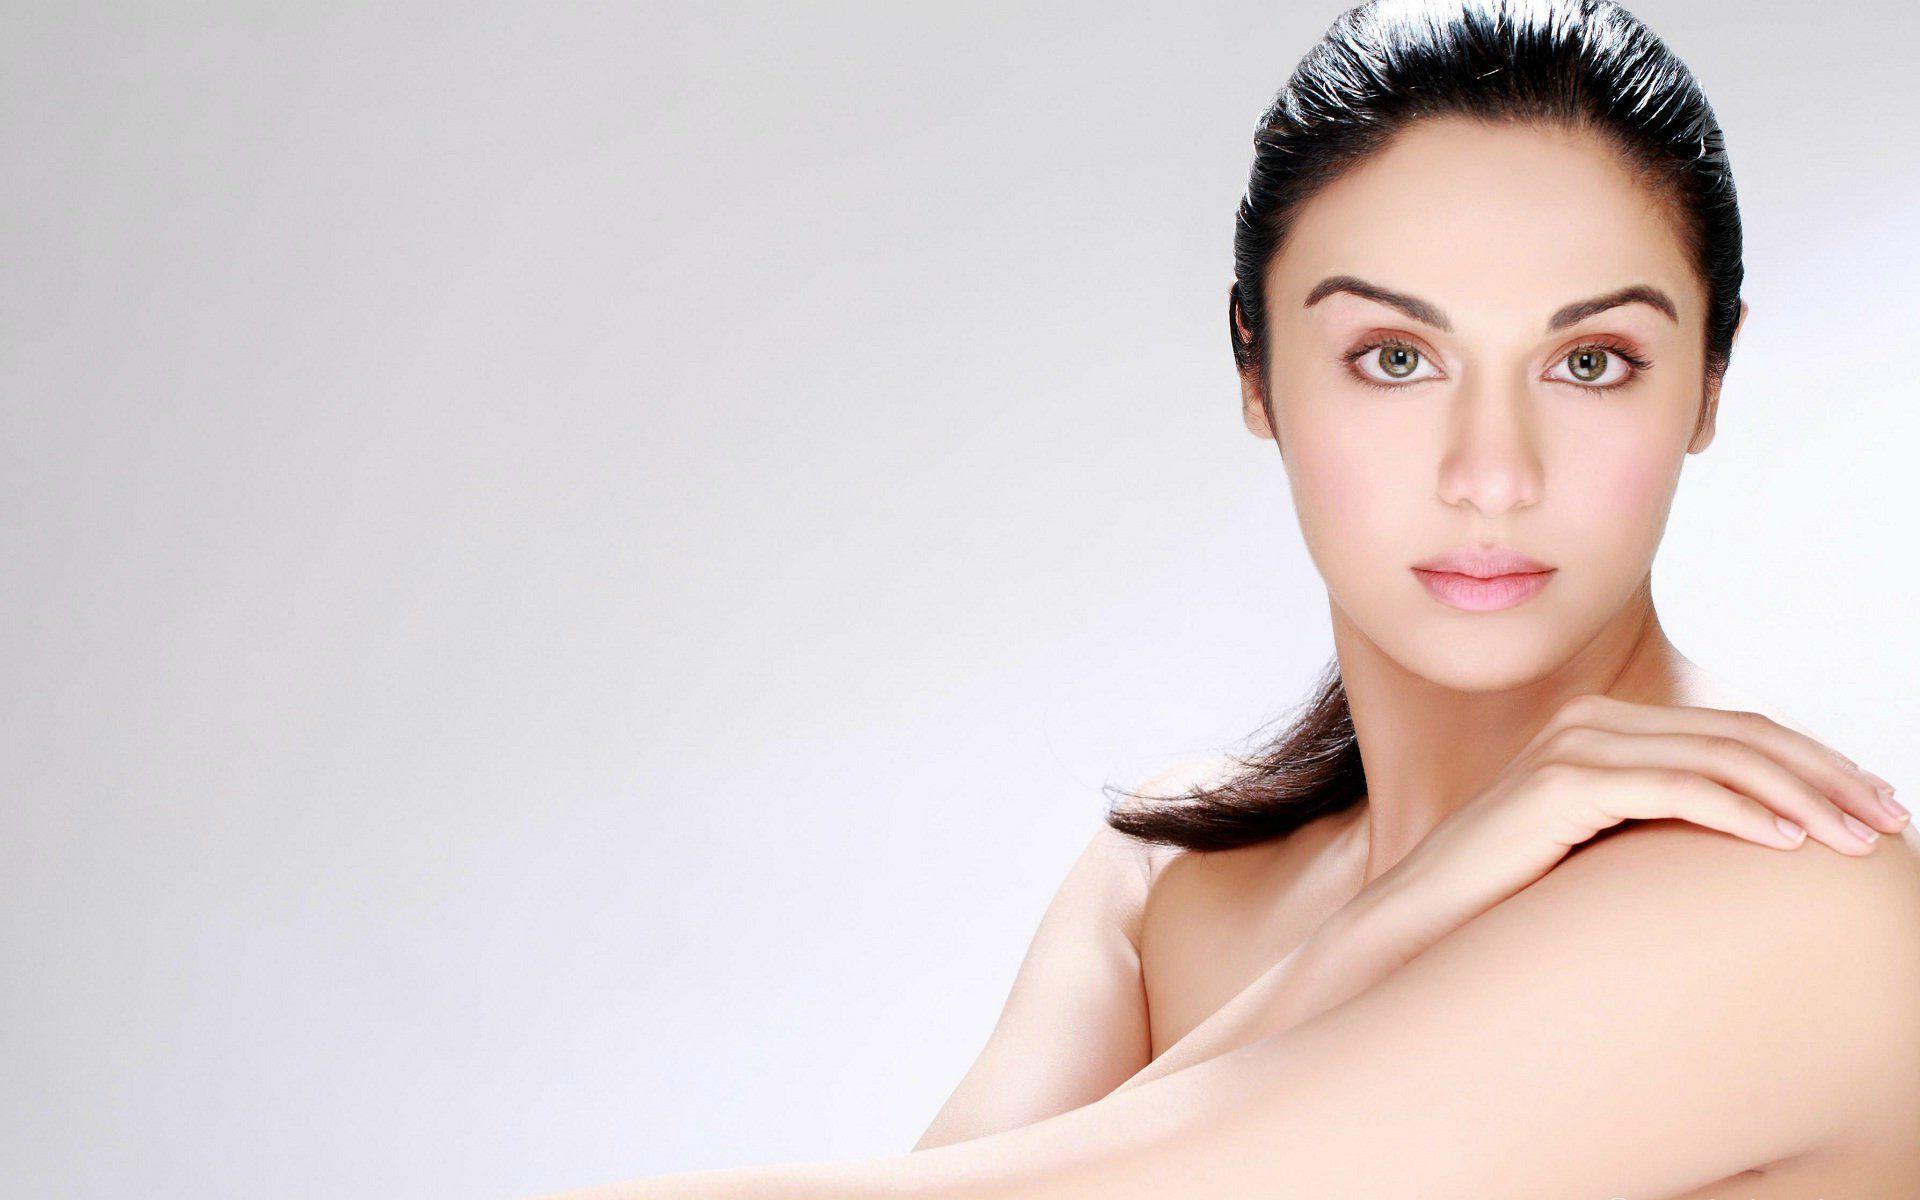 adah-sharma-fairy-skin-beauty-actress-beauty